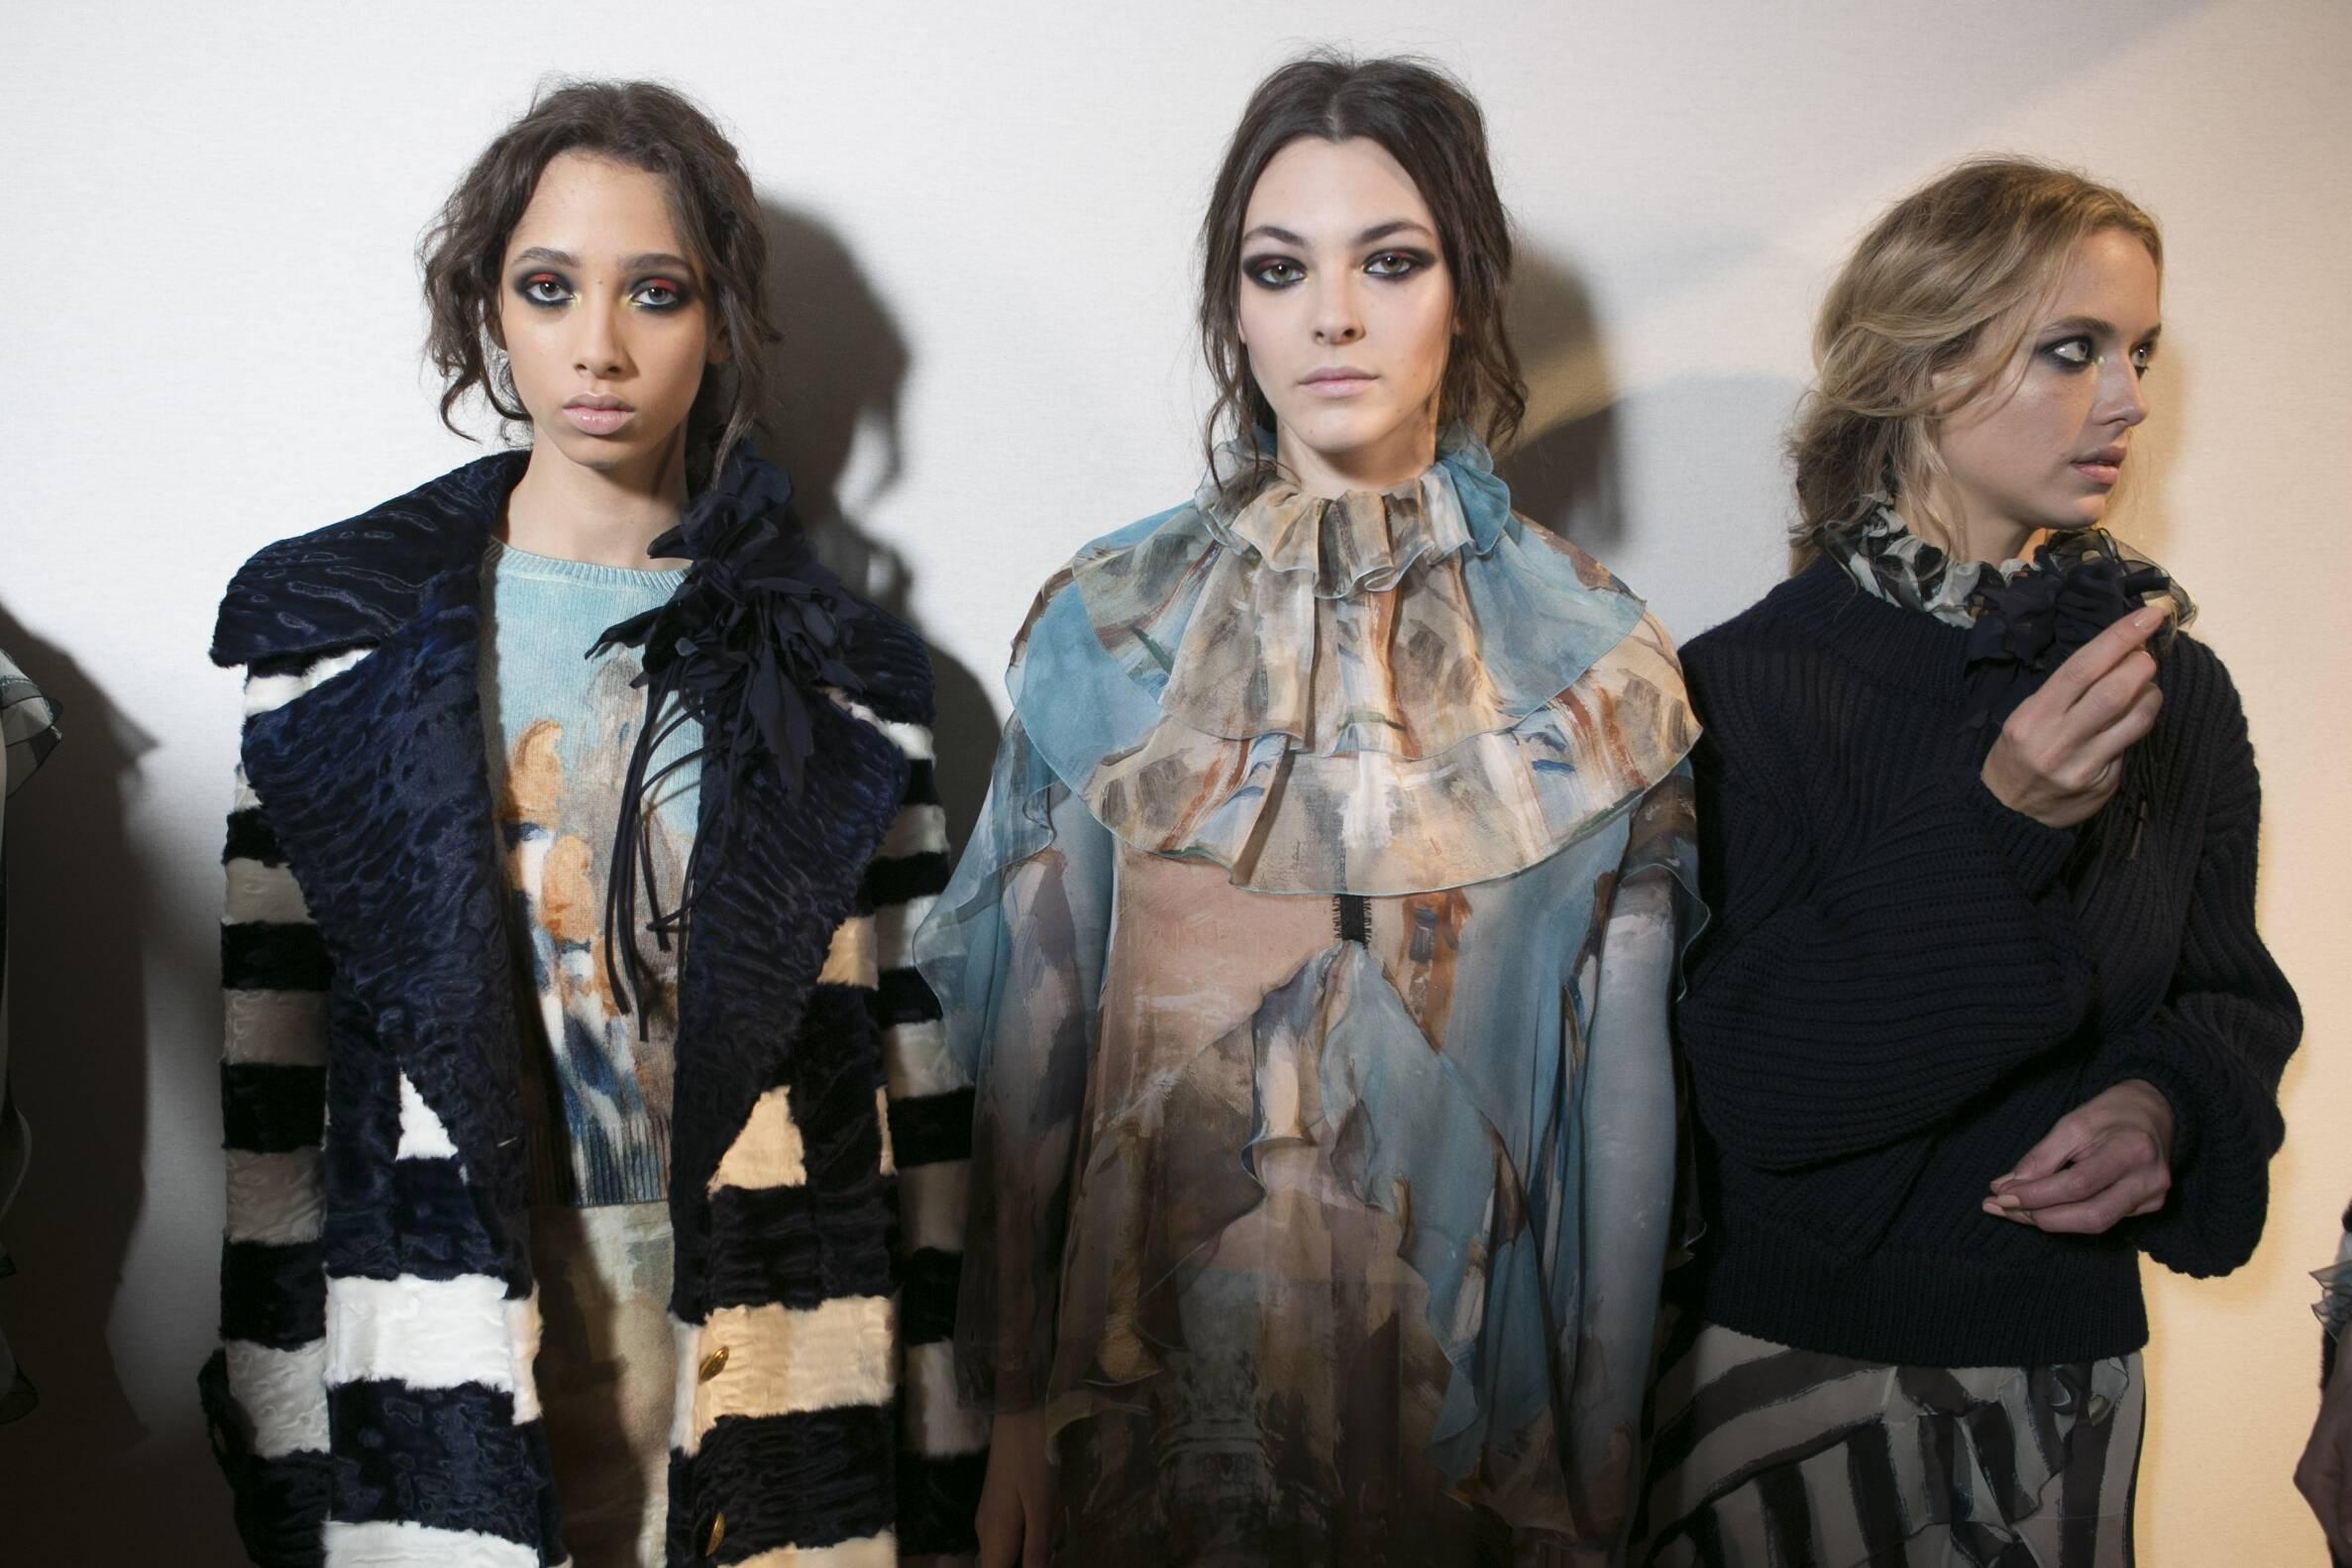 Backstage Alberta Ferretti Milan Fashion Week Models